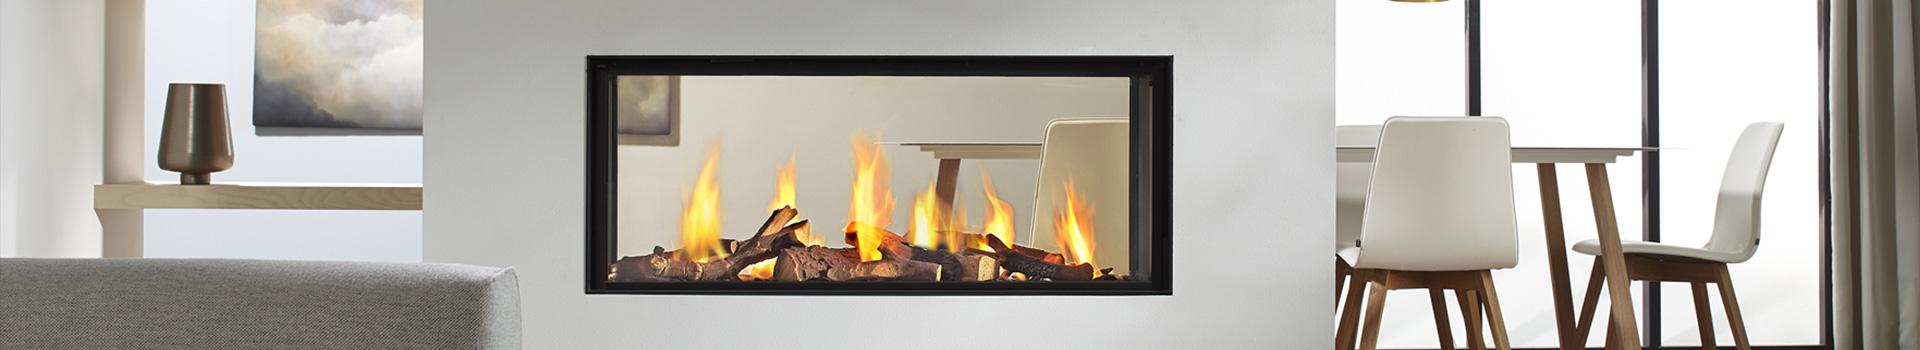 chemin e gaz installation chemin e springer. Black Bedroom Furniture Sets. Home Design Ideas